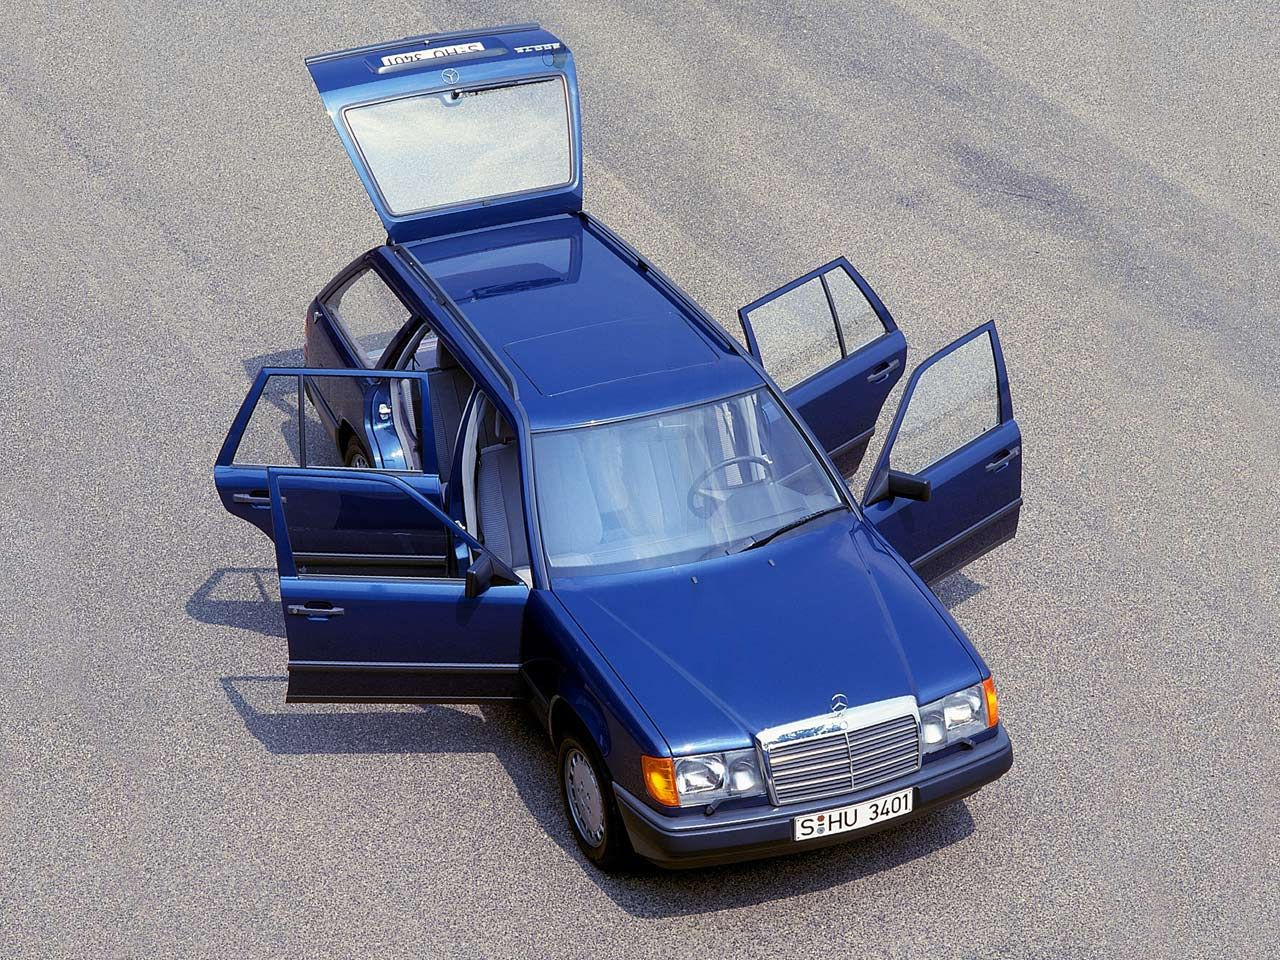 1986 92 Mercedes Benz 300 Te S124 Mercedes Benz 300 Mercedes Mercedes Benz